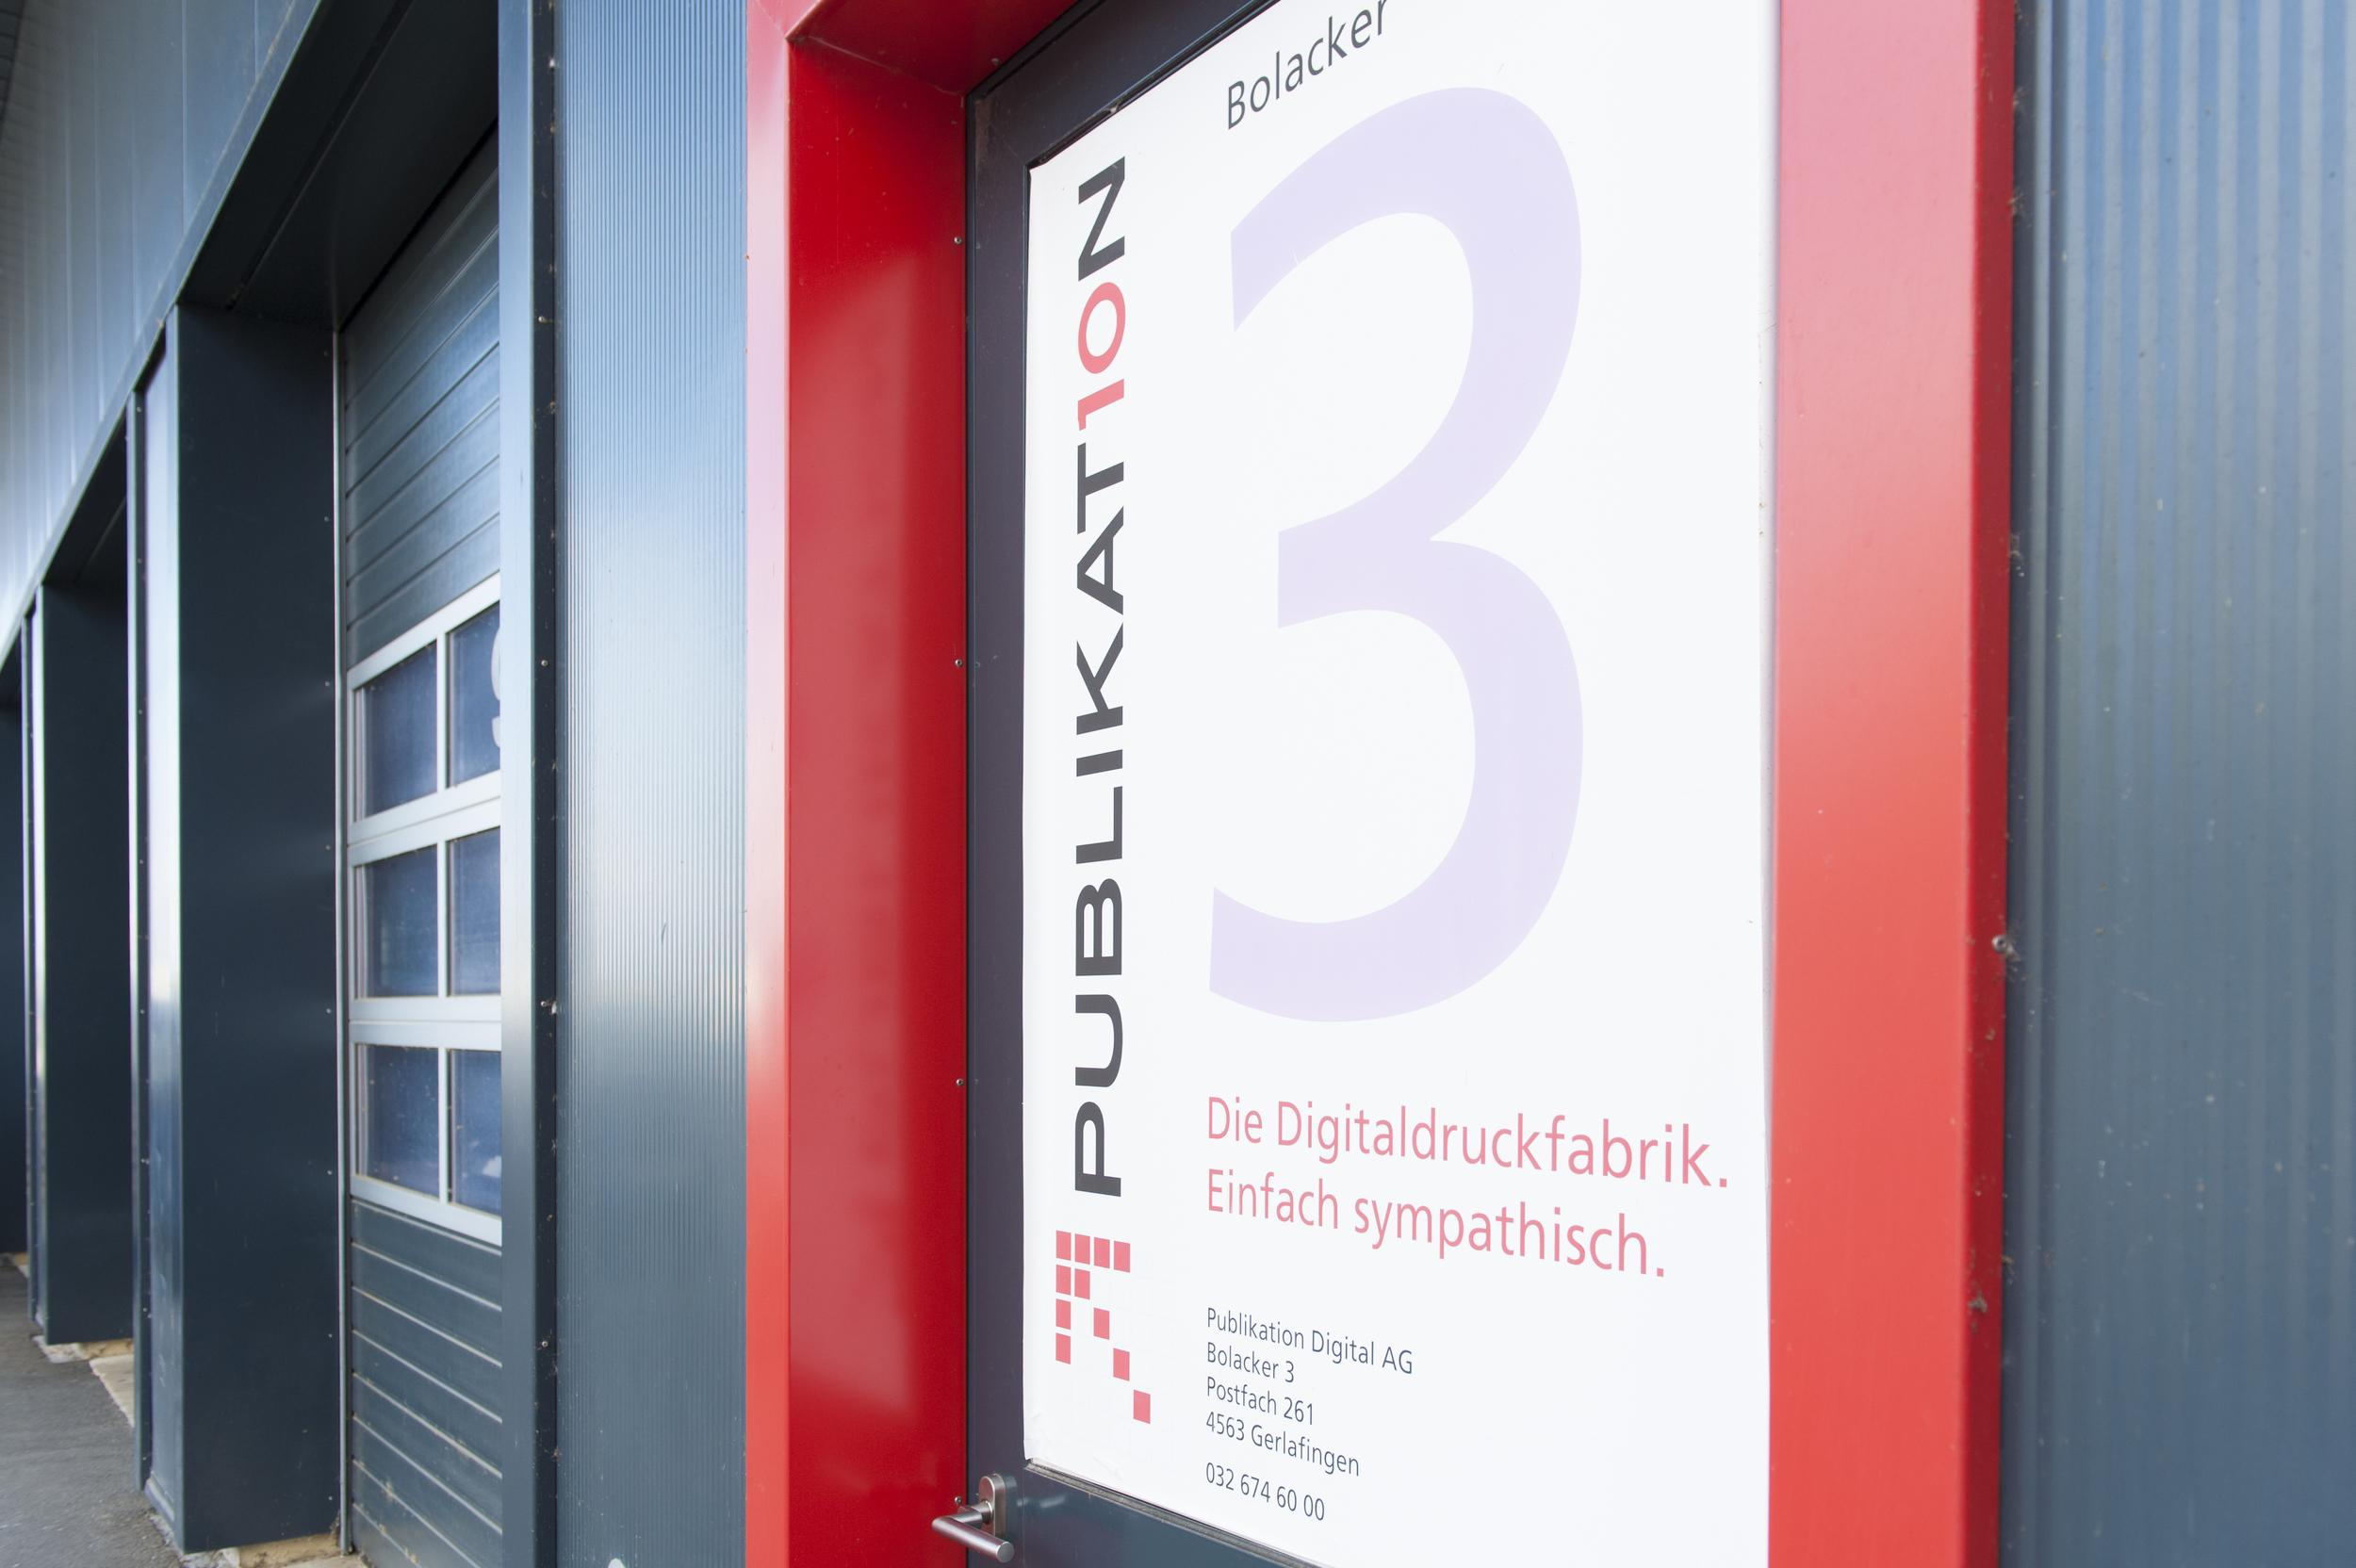 Auftraggeber: Publikation Digital AG